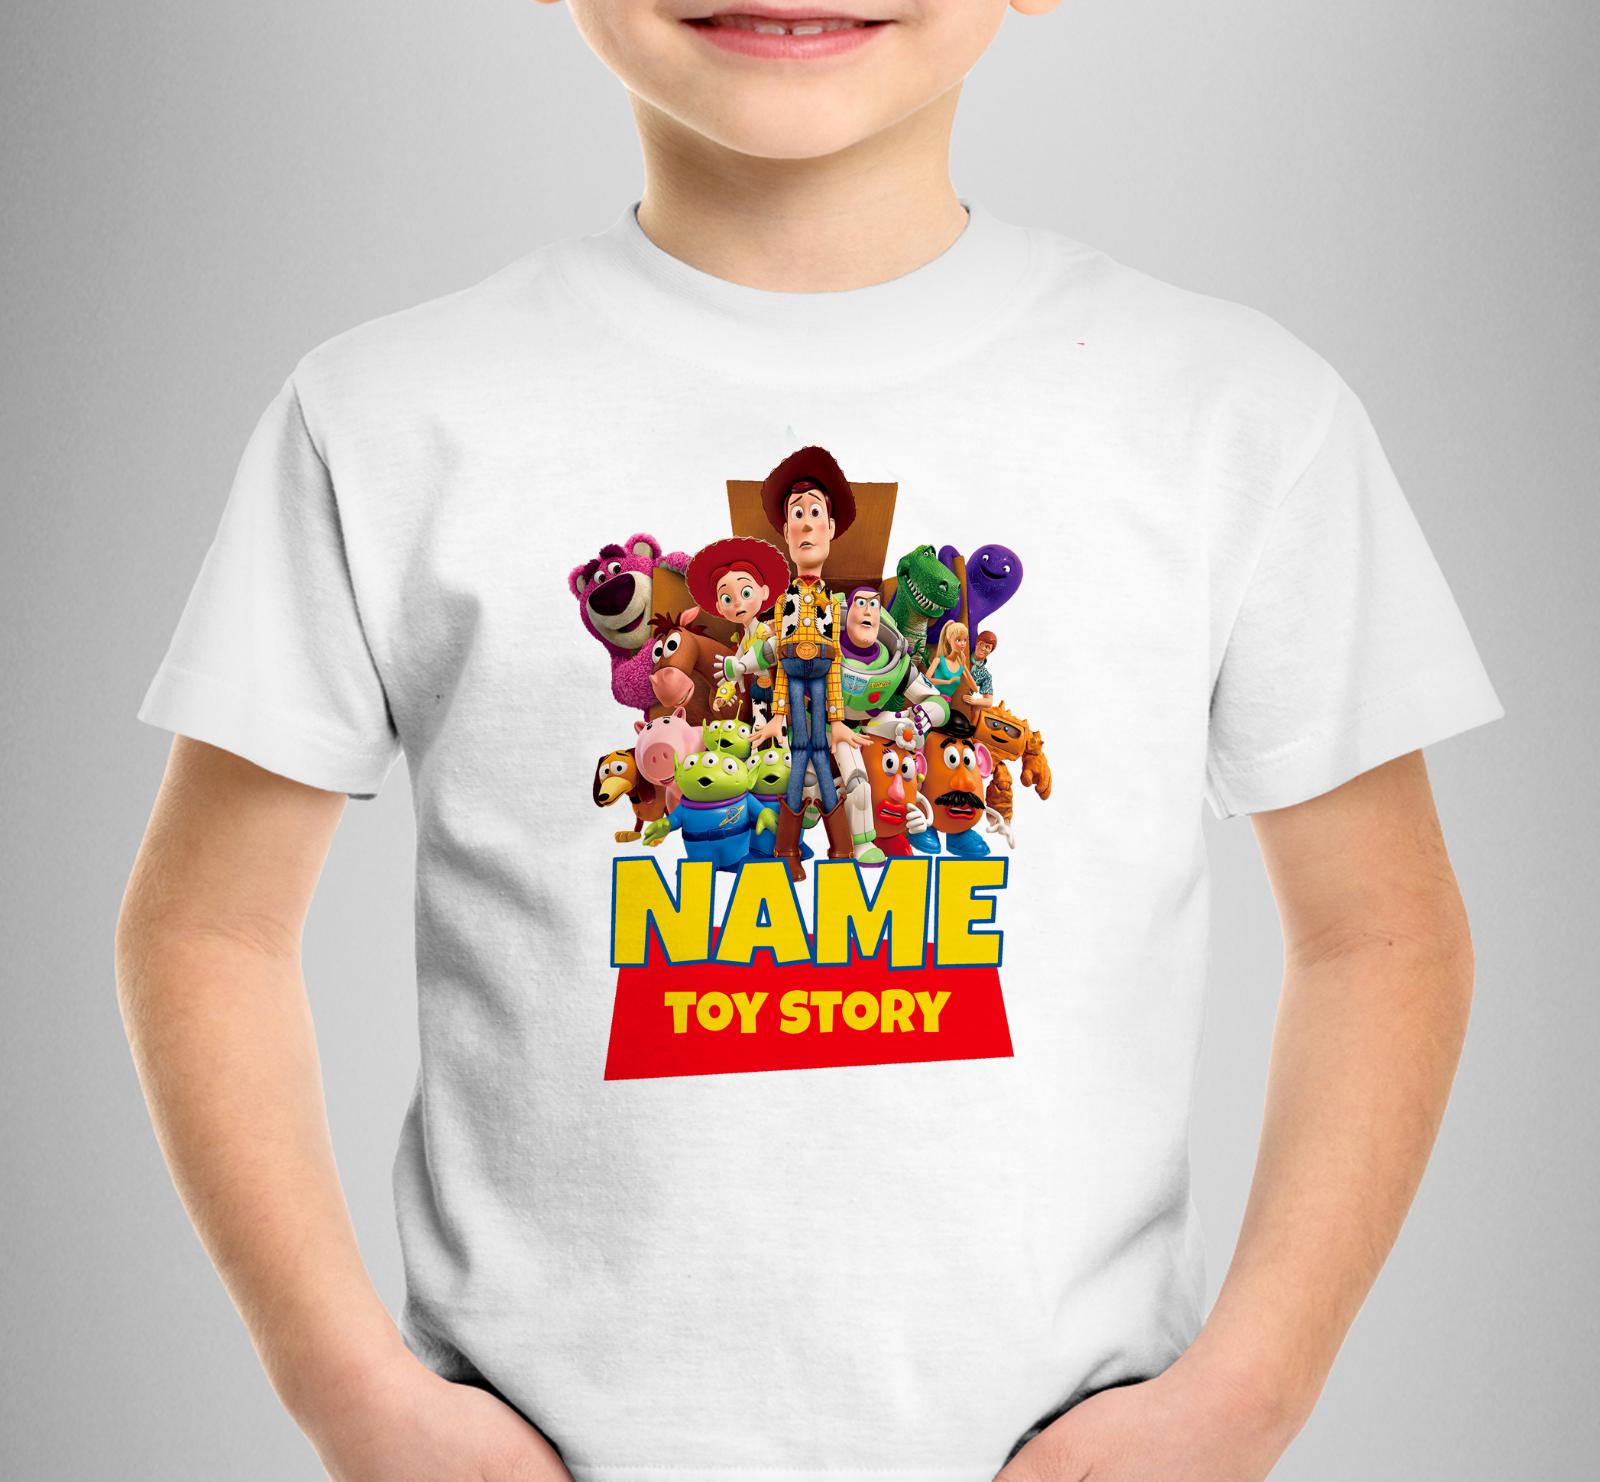 BNWT Disney Toy Story Garçons Rouge T-shirt Âge 7-8 Ans